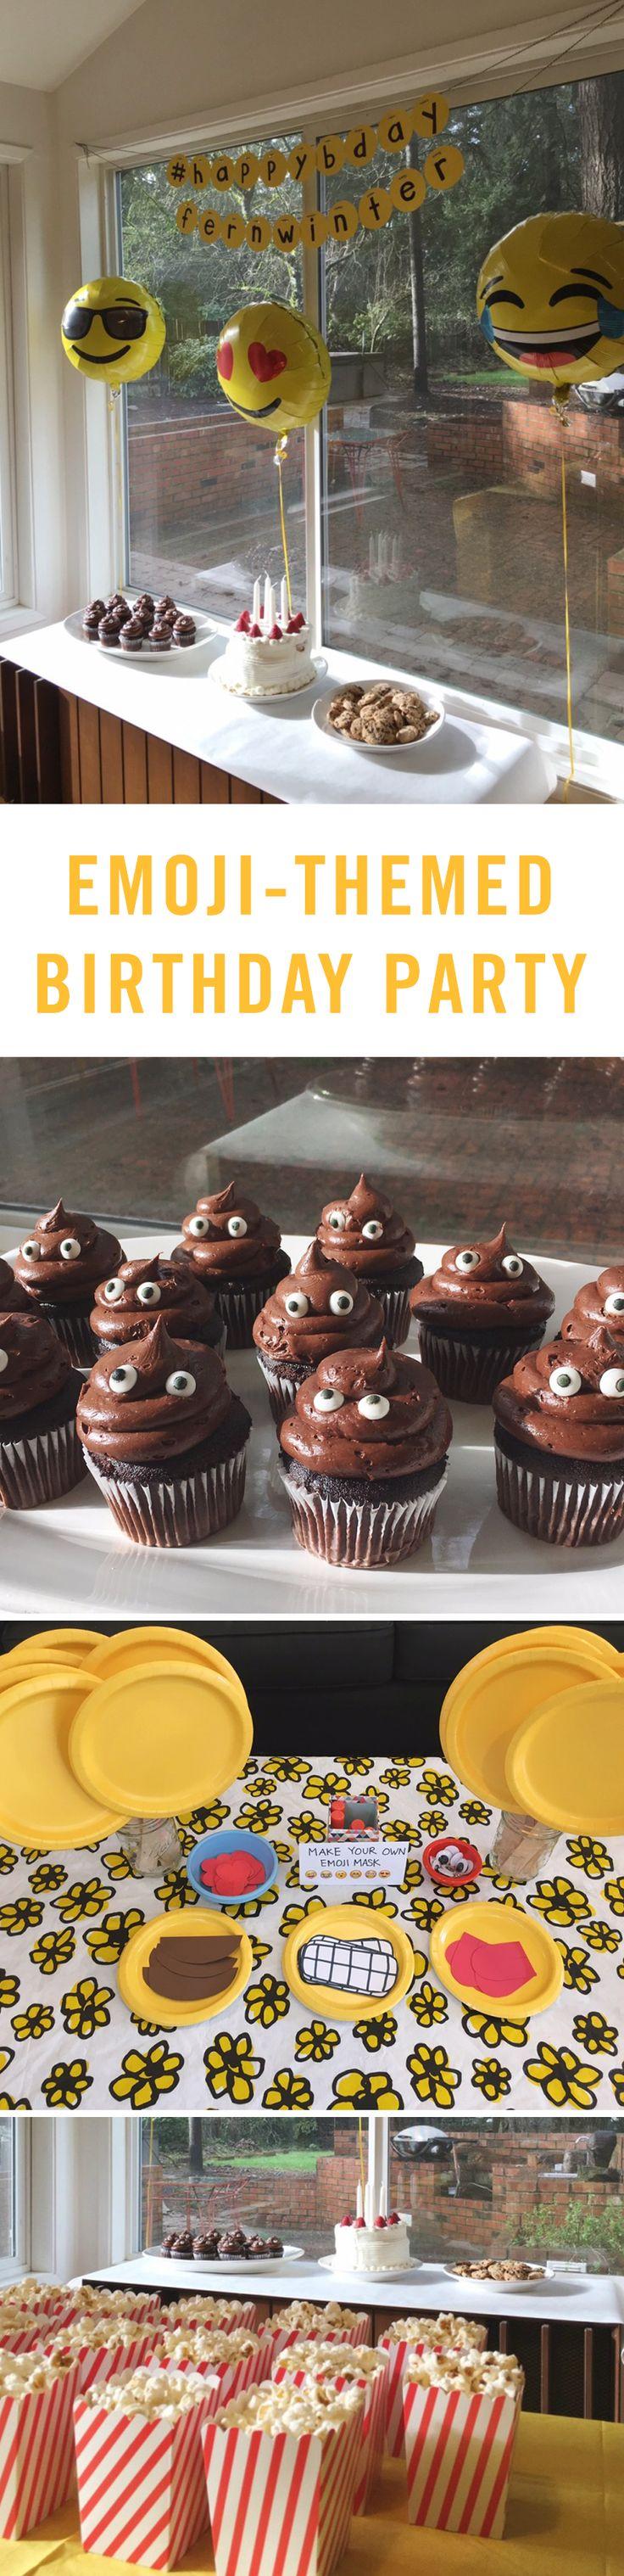 best party ideas images on pinterest birthdays party ideas